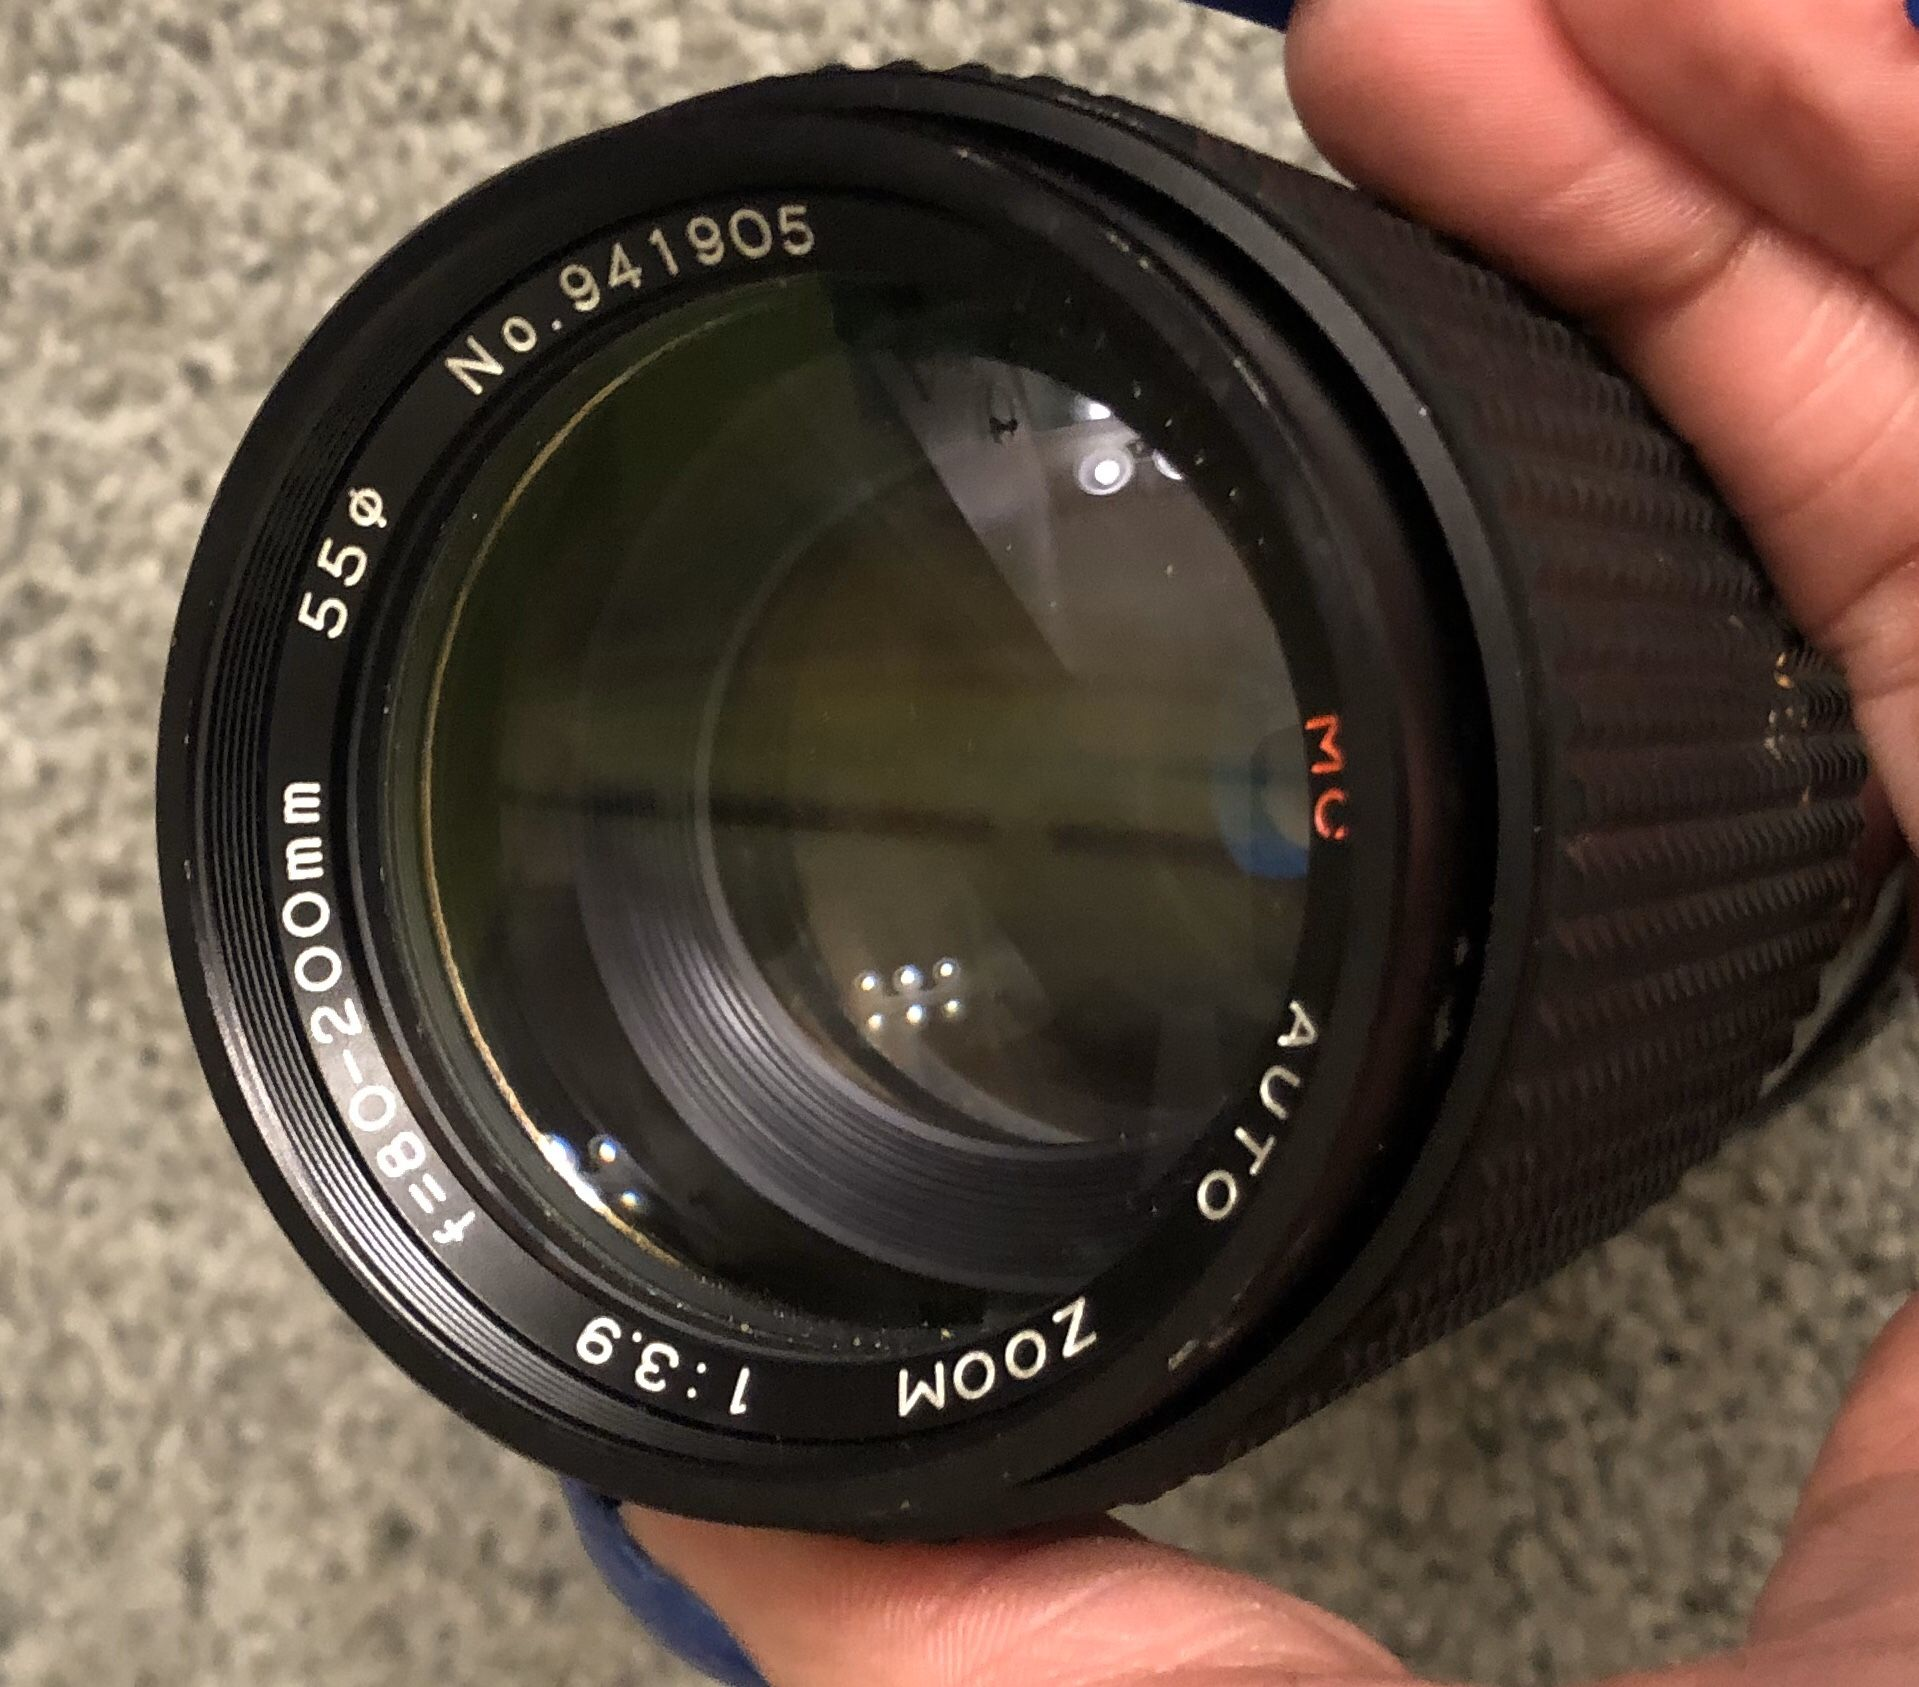 Canon 80mm-200mm lense